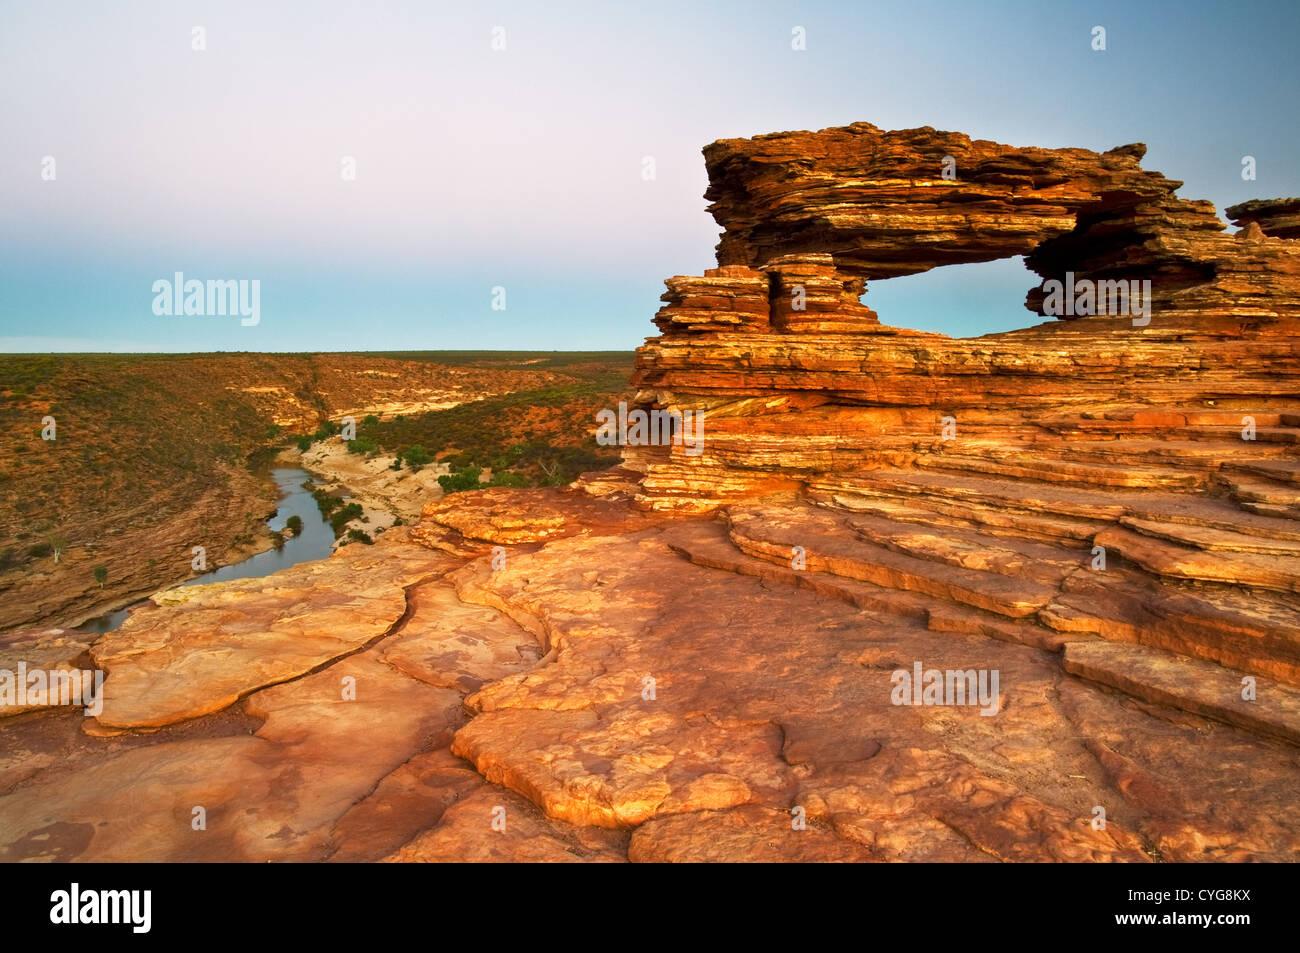 Naturalezas ventana sobre el acantilado de Murchison River Valley. Imagen De Stock